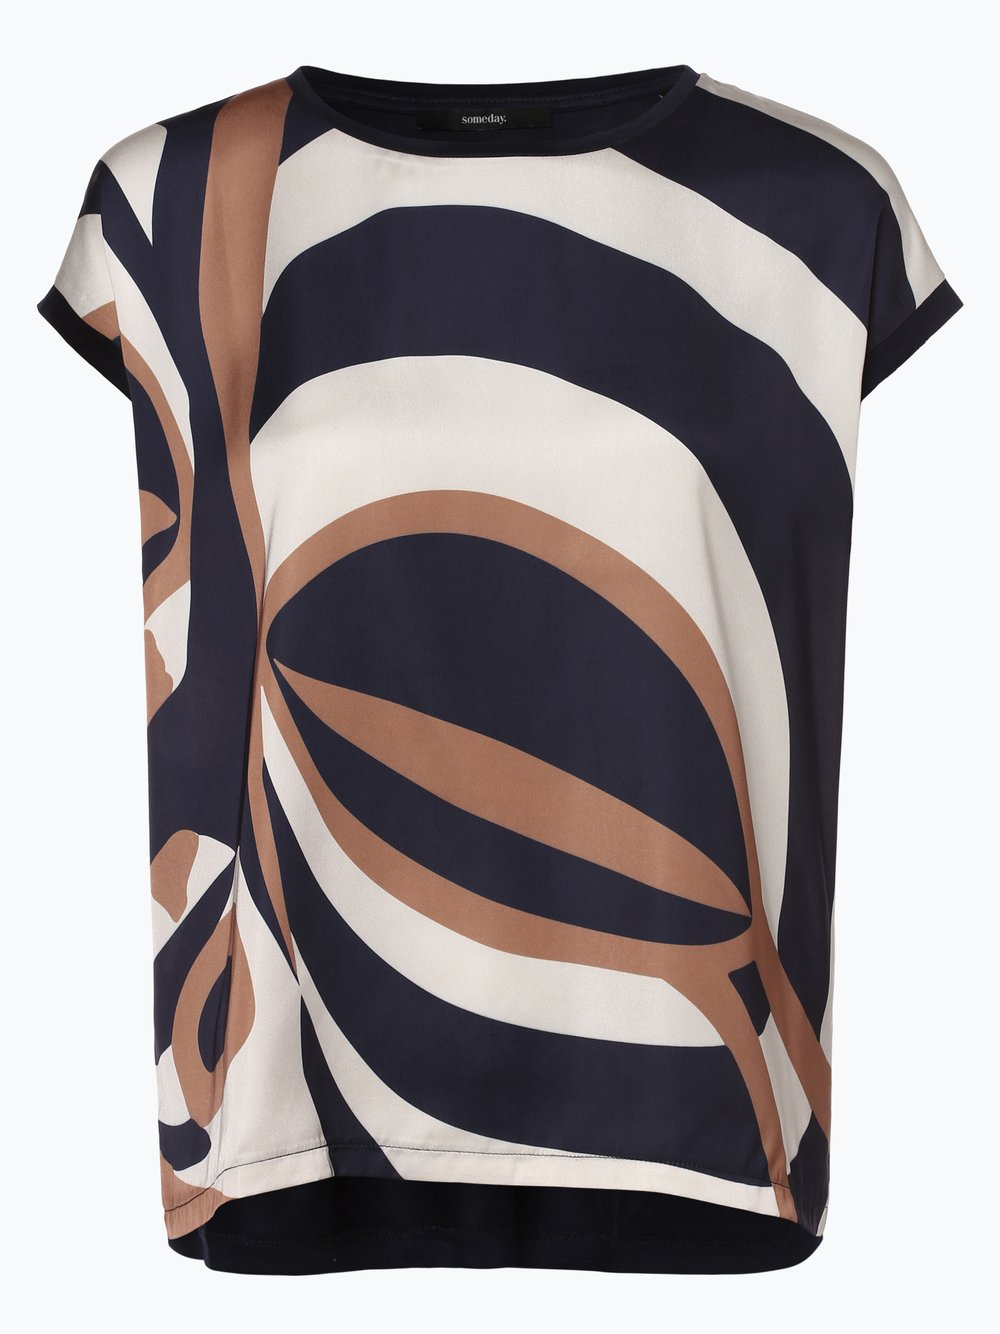 someday damen t-shirt - kori ethno sq2 online kaufen   peek